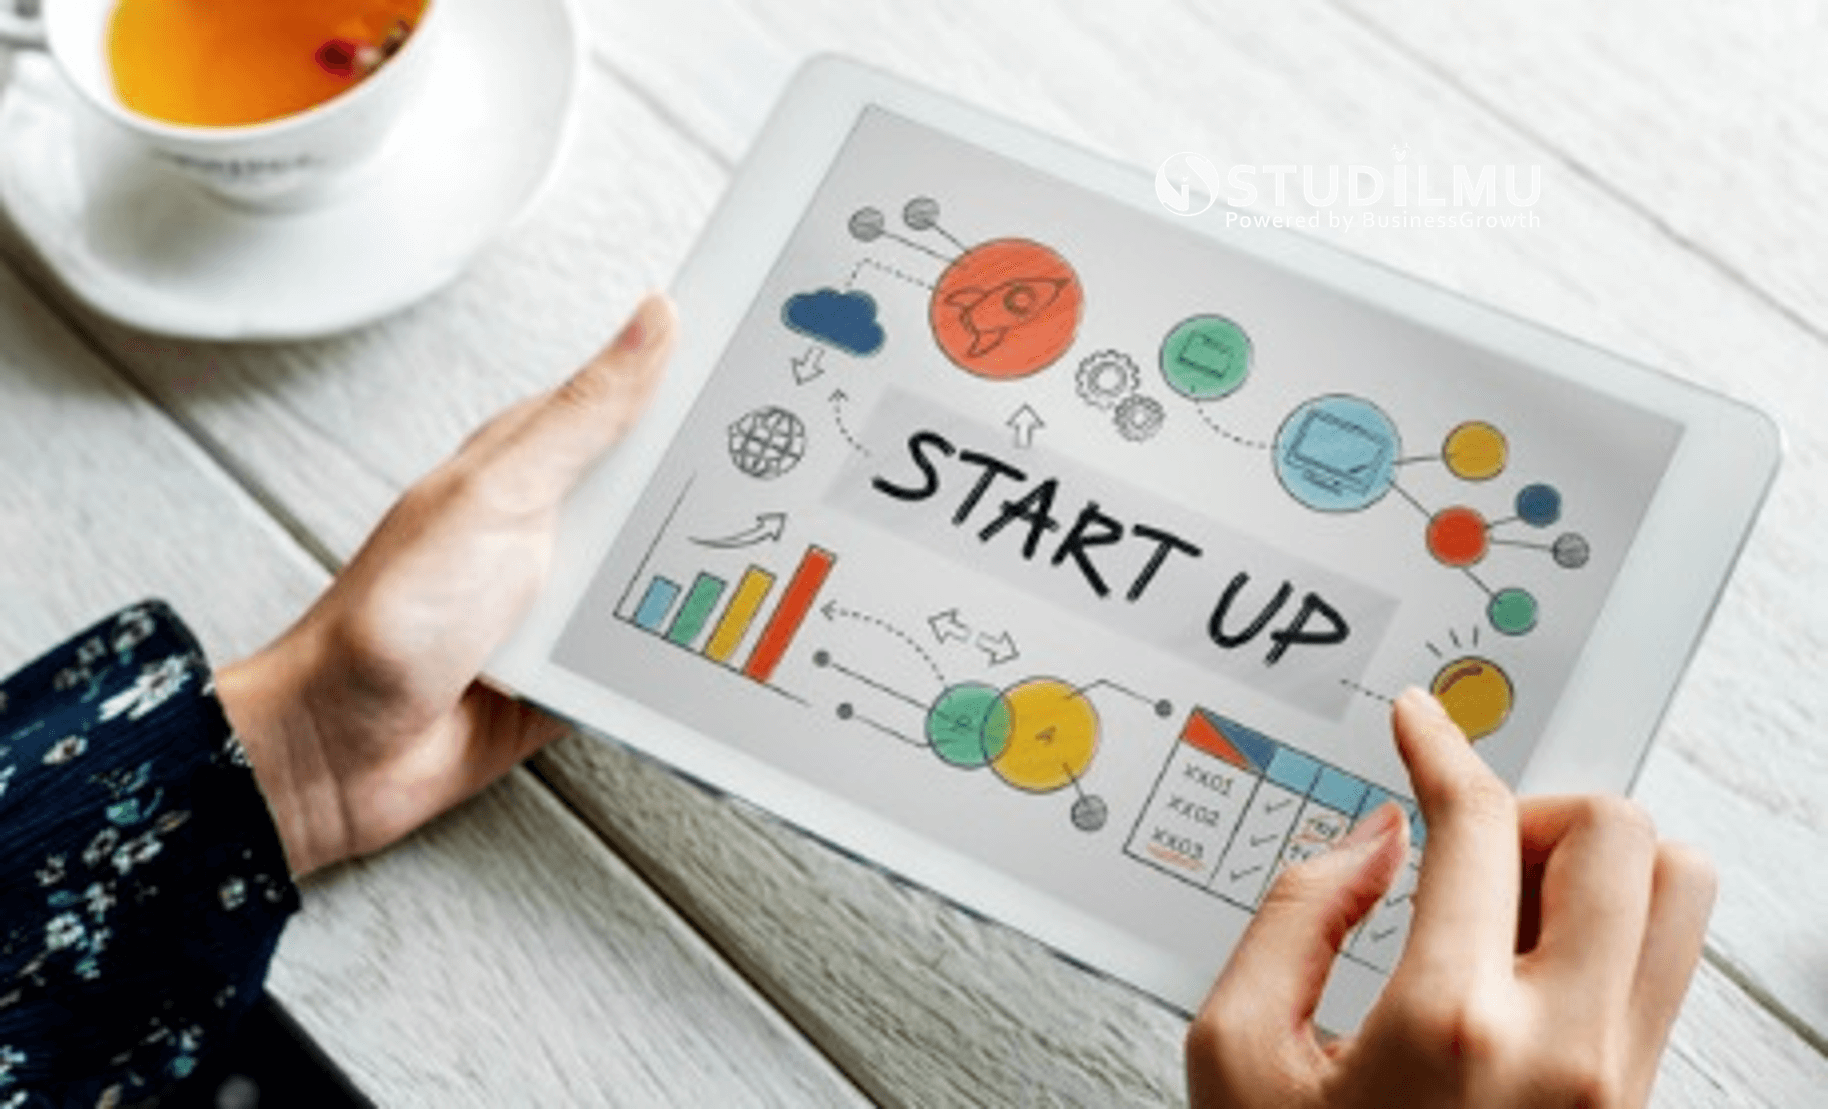 STUDILMU Career Advice - 6 Tanda Bisnis Startup Kita akan Sukses